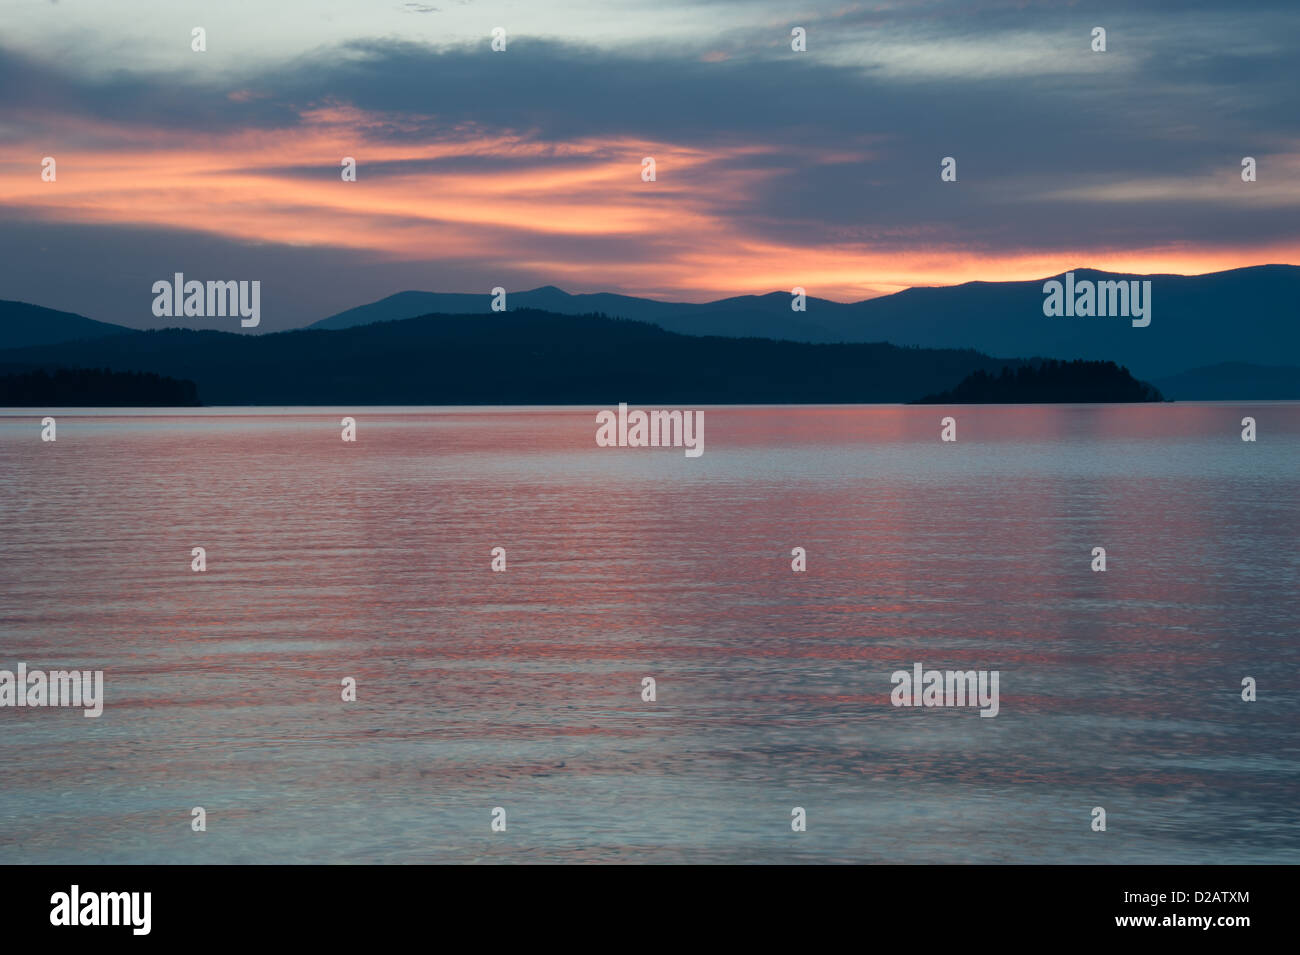 Summer sunset on Lake Pend Oreille in northern Idaho. - Stock Image